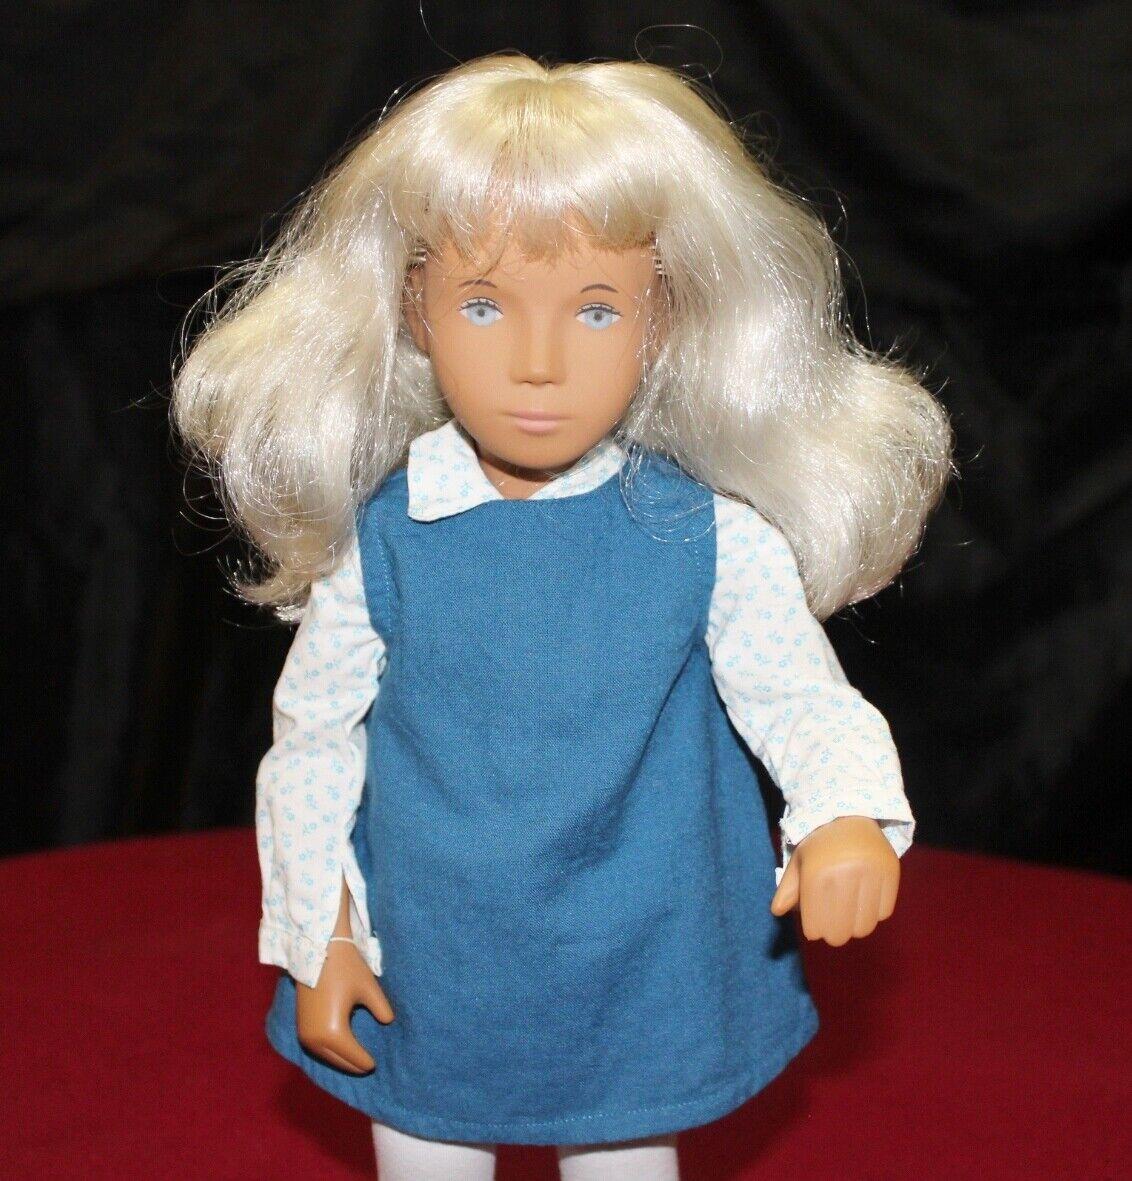 16  Vintage 115 Sasha Doll Blonde Tunic Hair,Blau Eyes,Made In England.